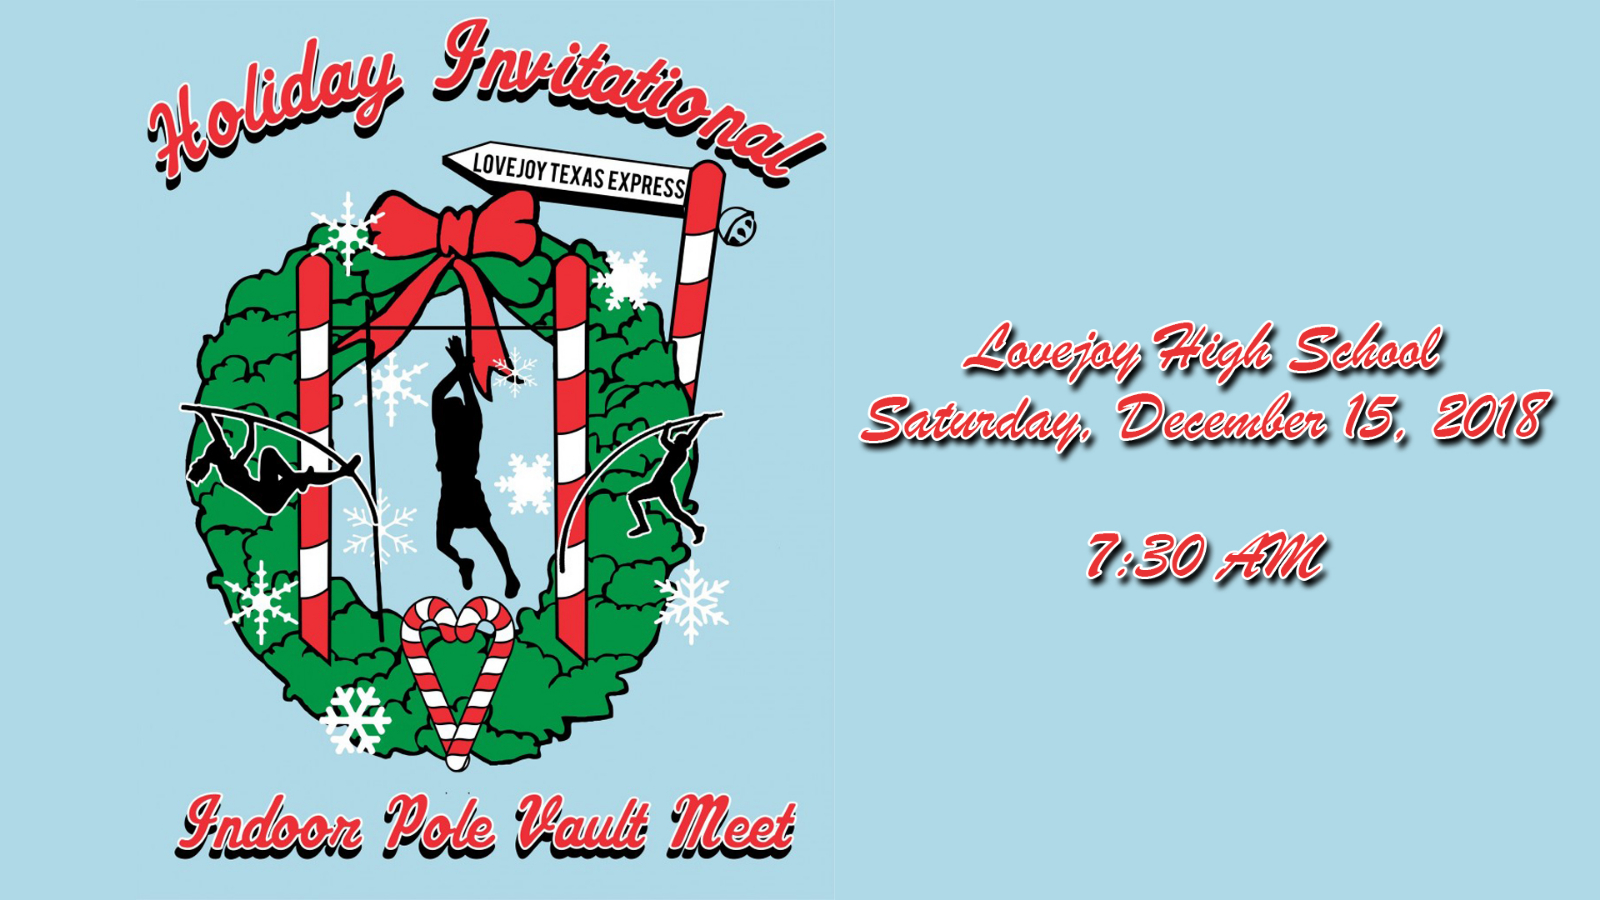 Holiday Invitational Indoor Pole Vault Meet set for Saturday